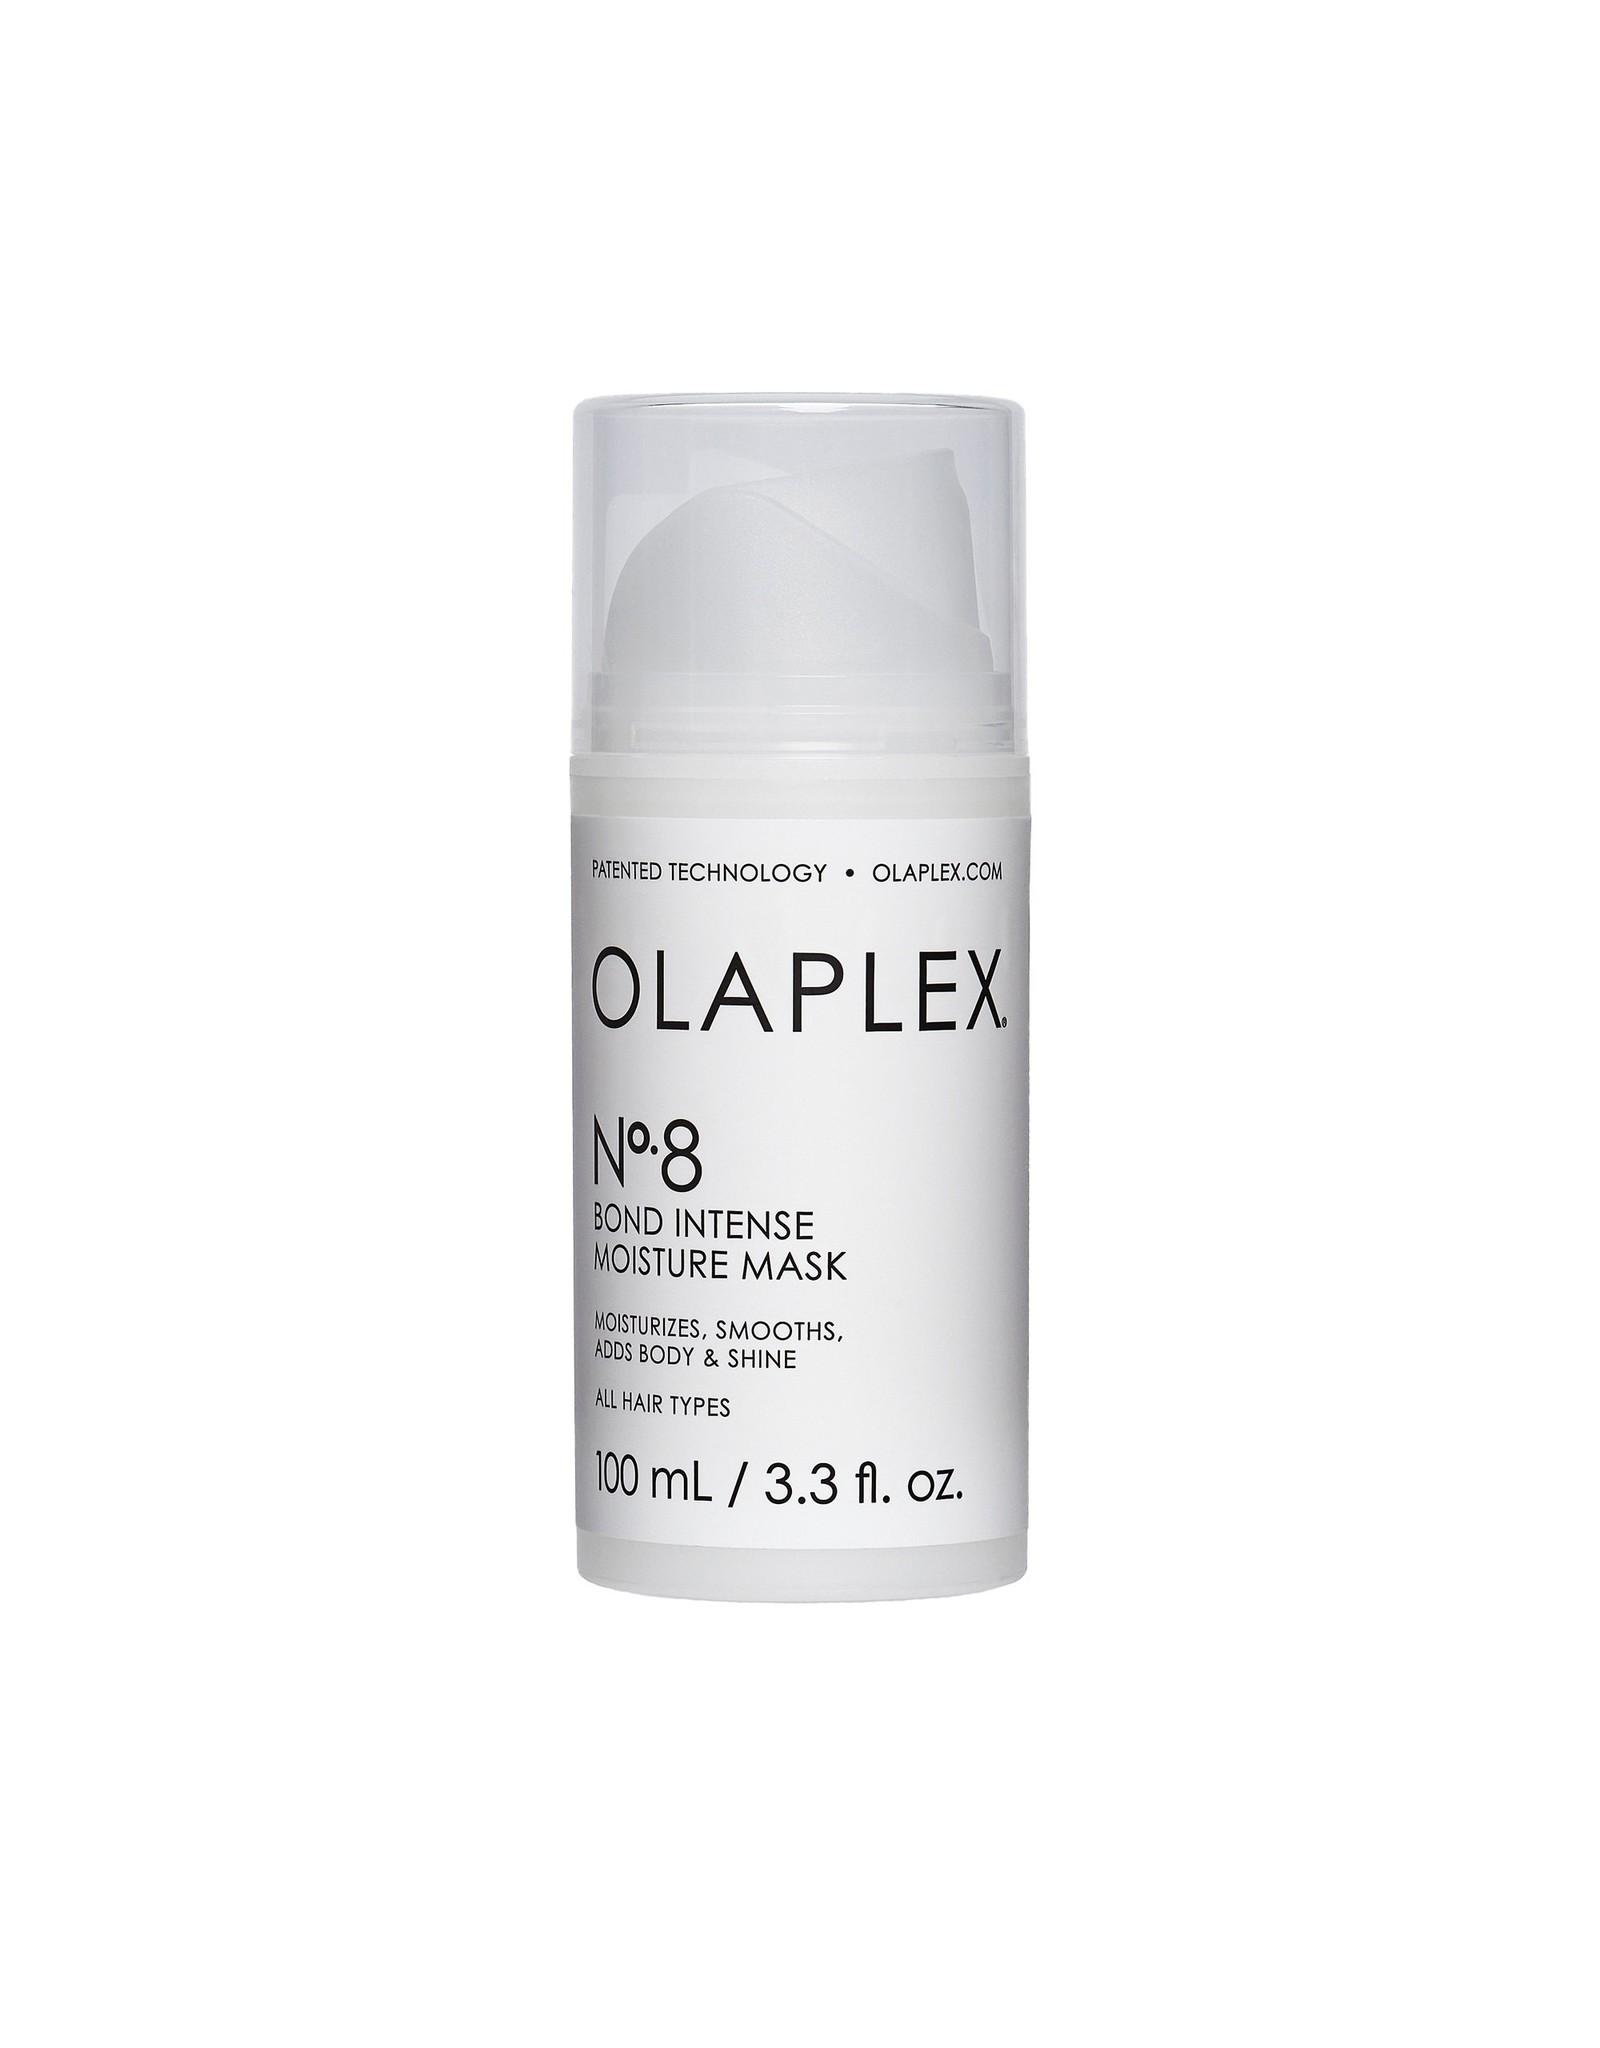 OLAPLEX N0 8. -  BOND INTENSE MOISTURE MASK ®️